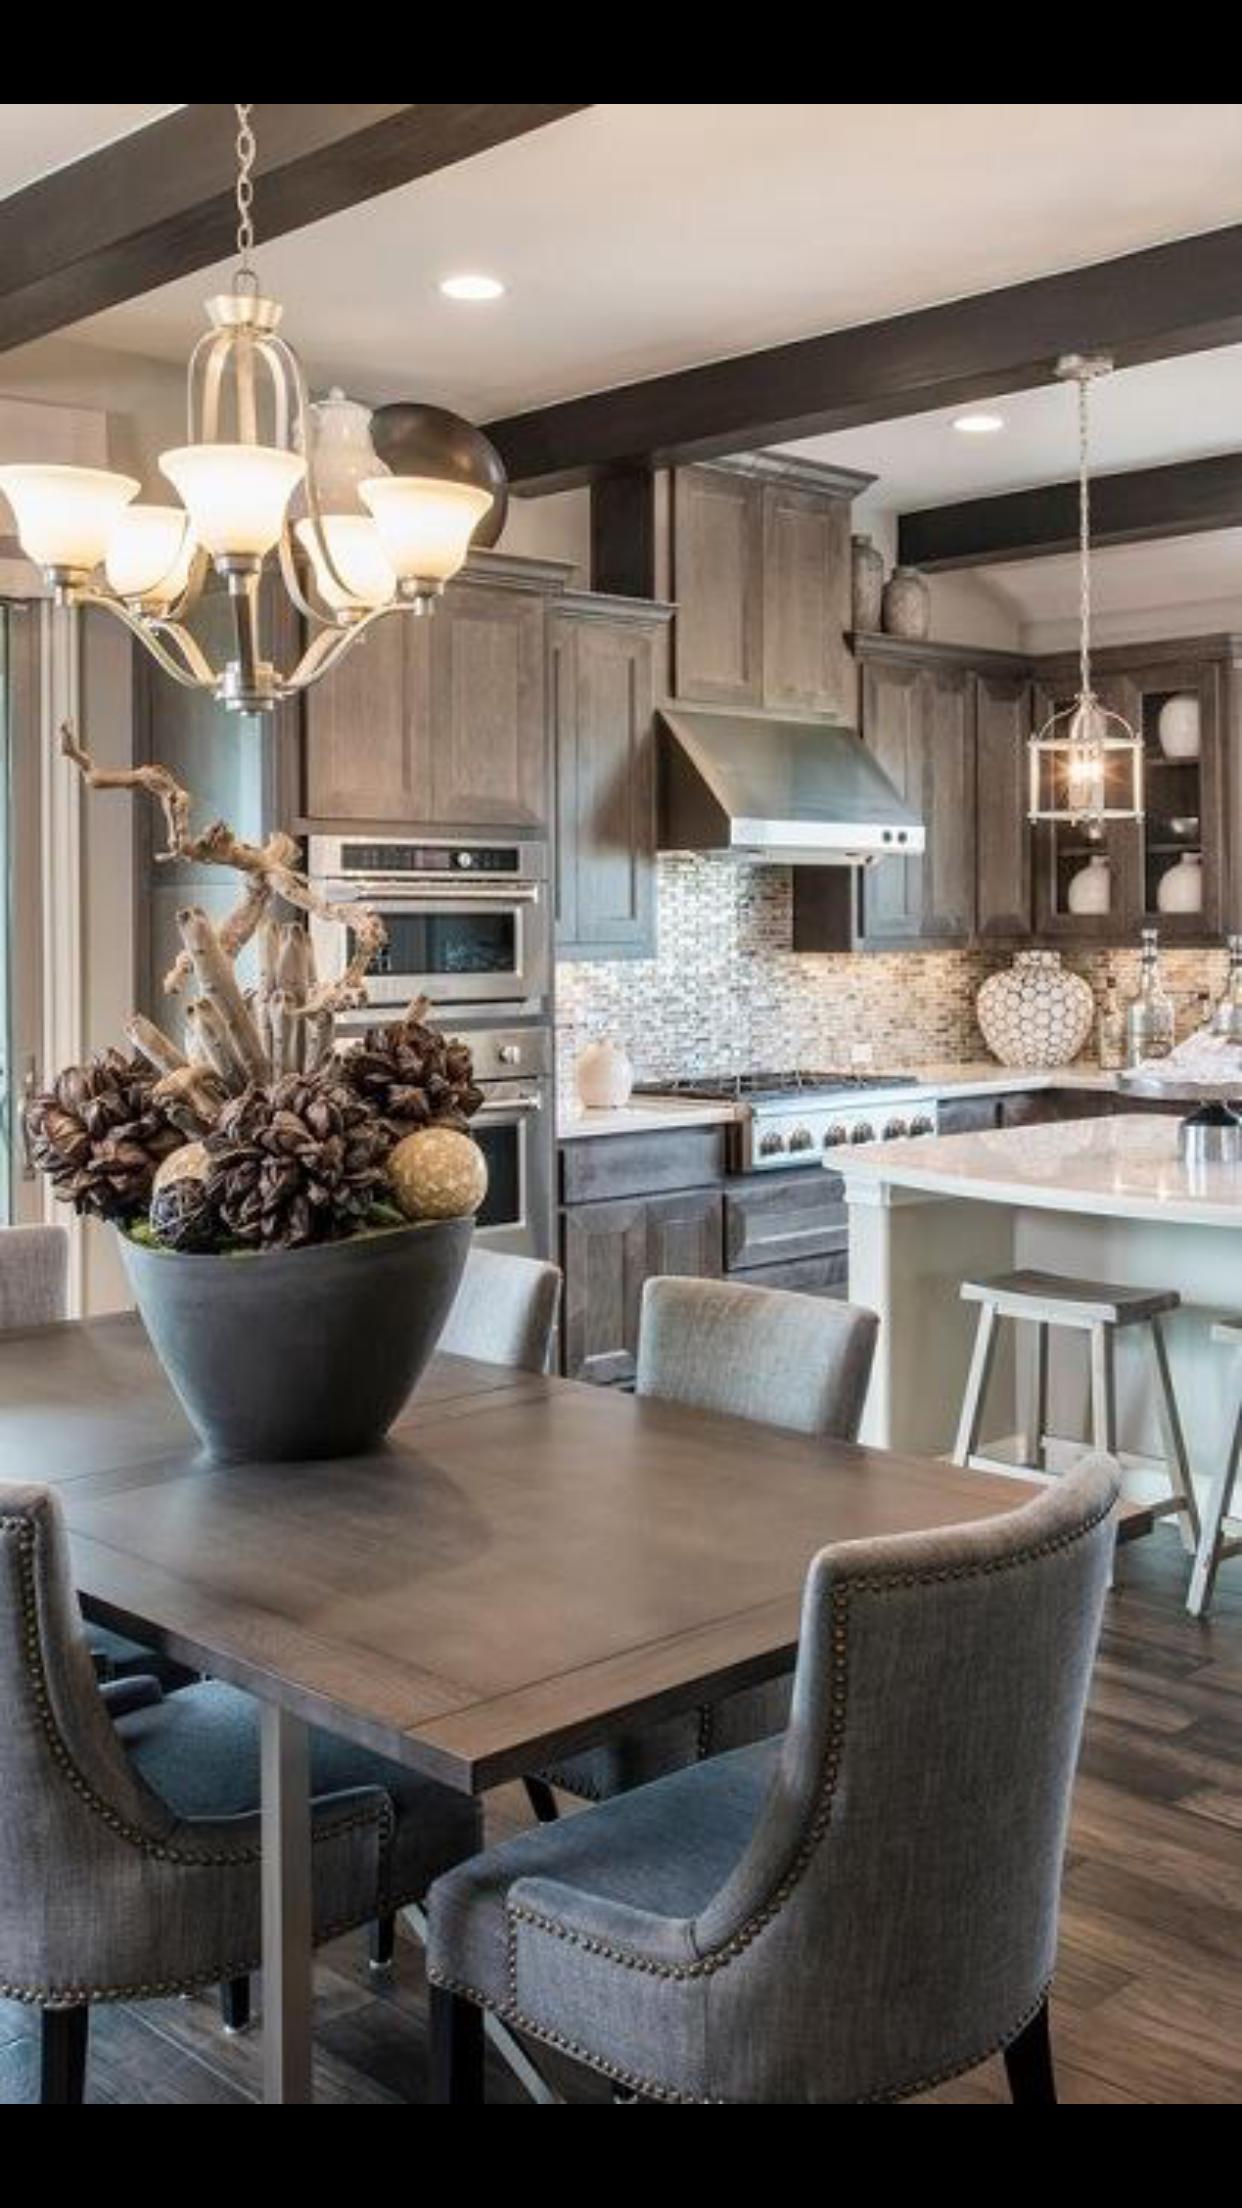 Pin de Mara Dibb en 2020 Kitchen Project | Pinterest | Cocinas ...